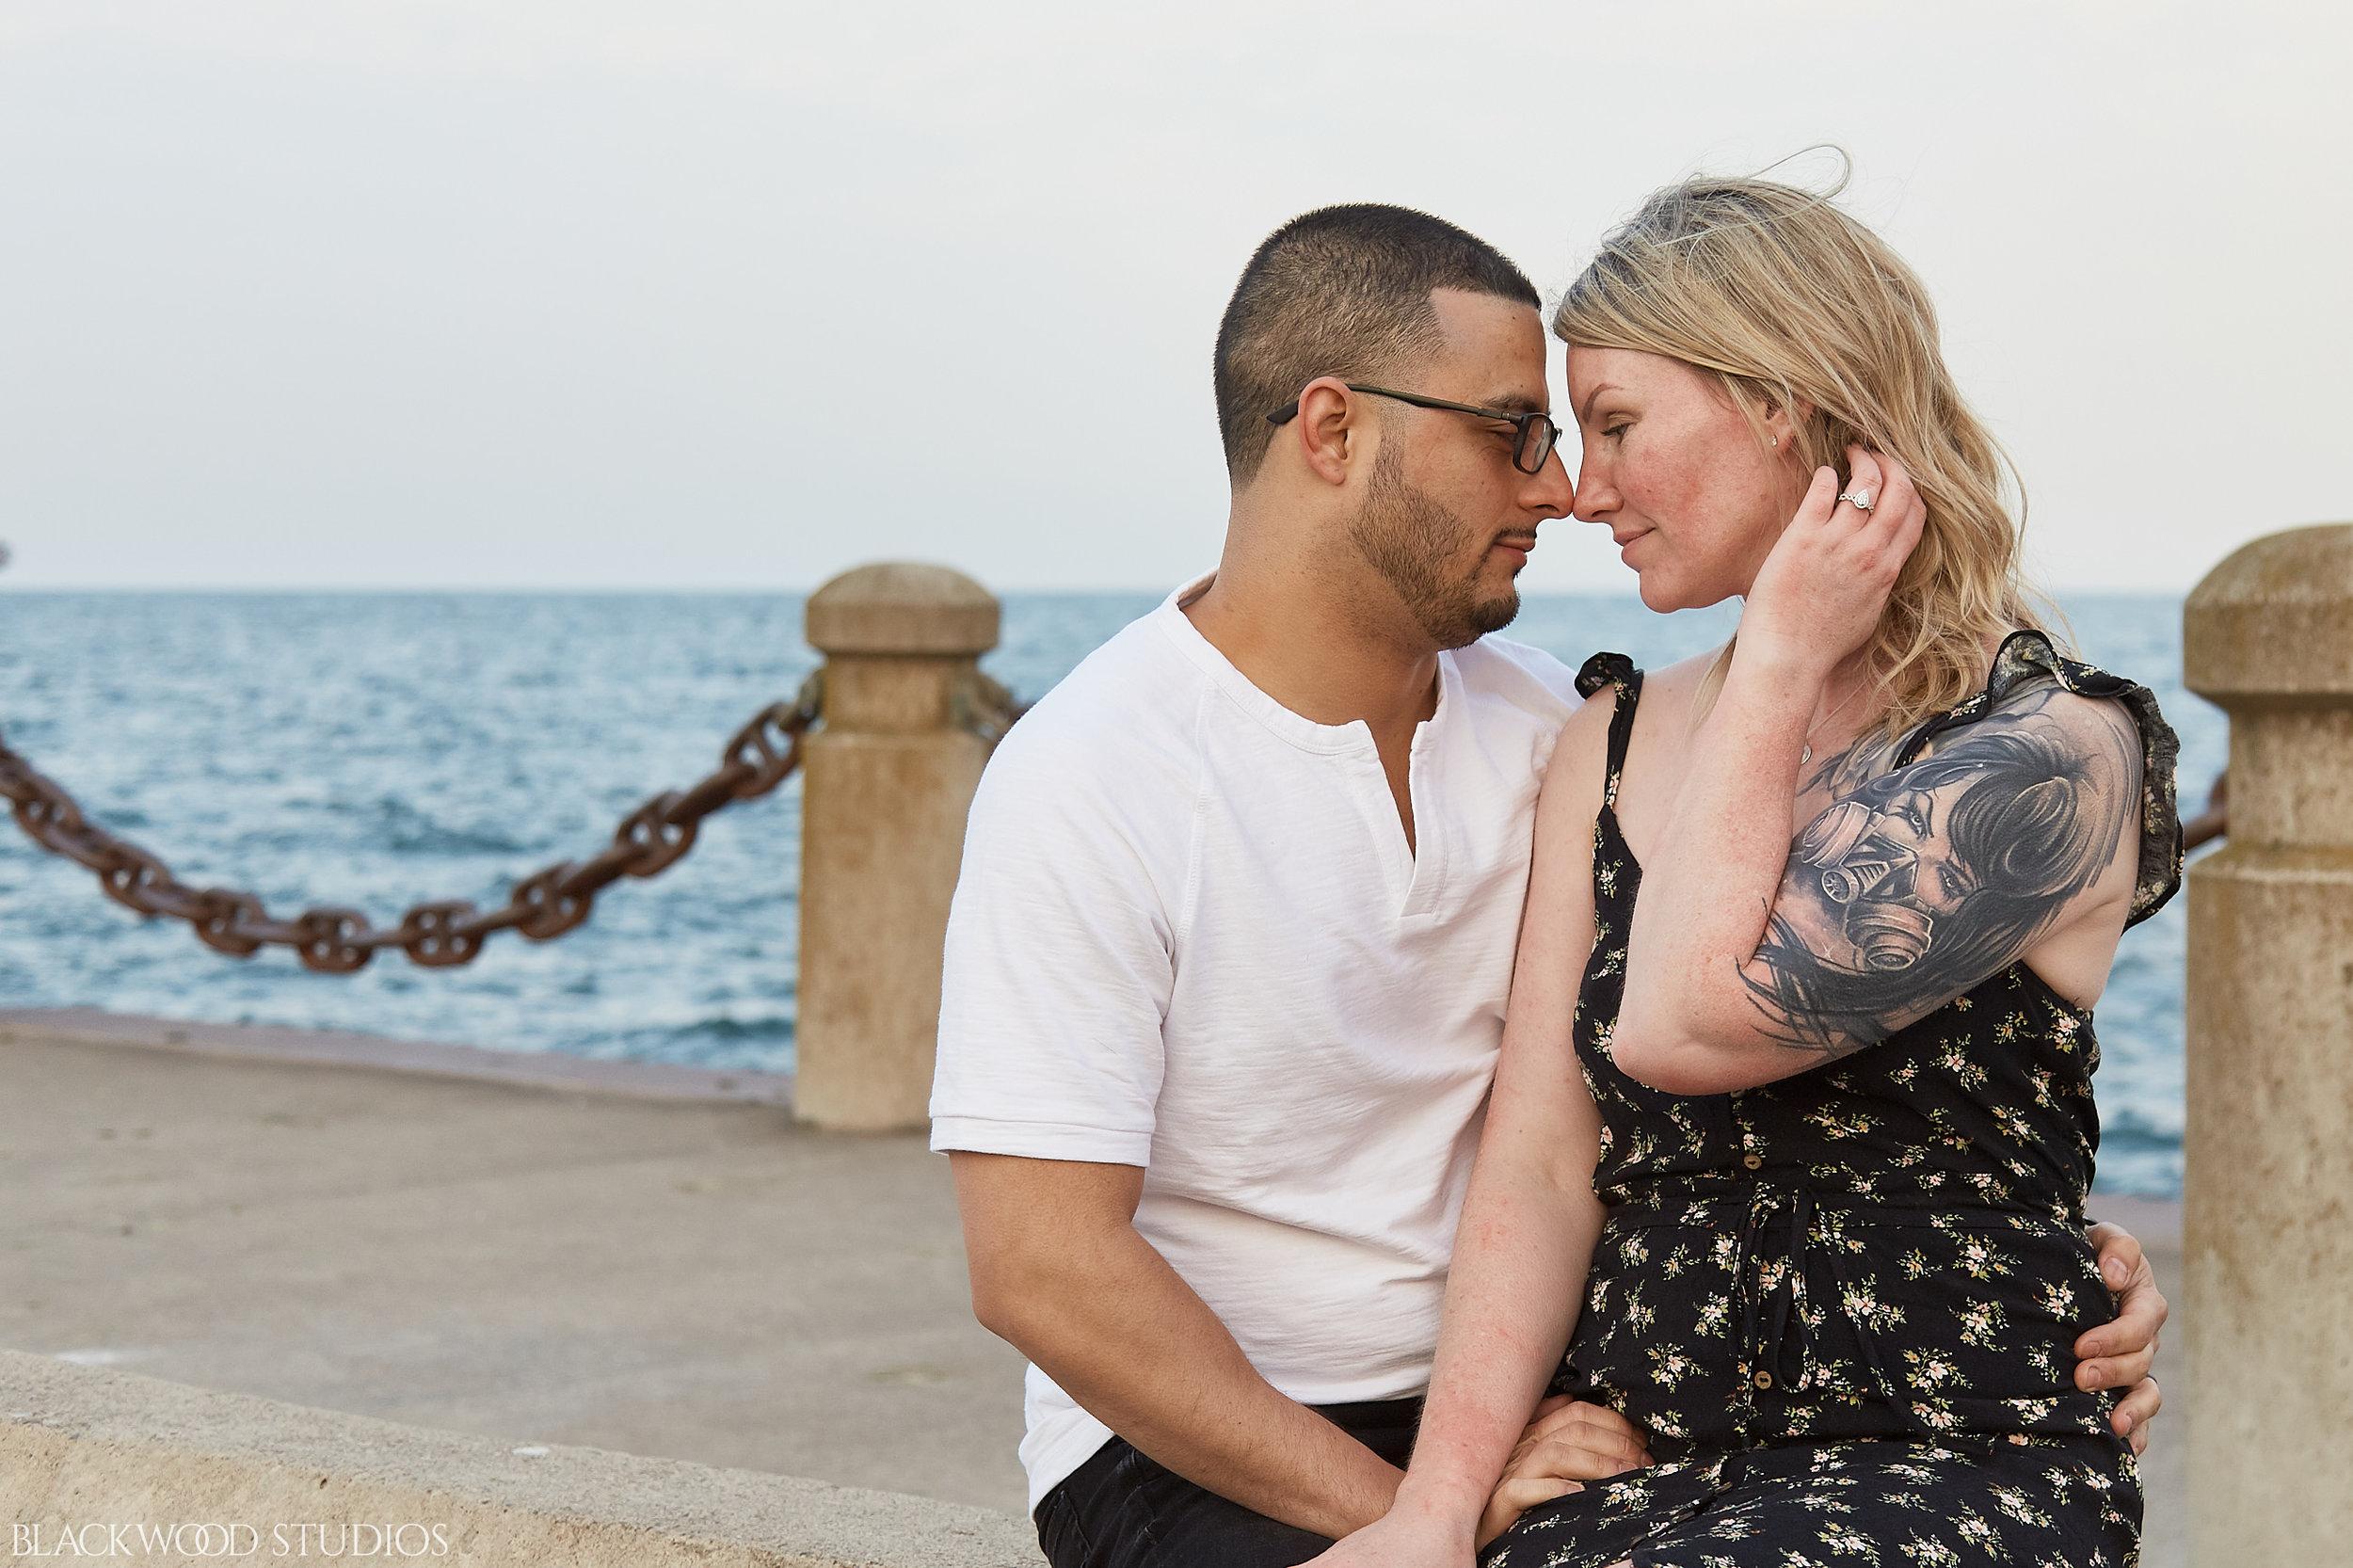 Blackwood-Studios-Photography-20190604200738-Shannon-and-Pedro-Engagement-Spencer-Smith-Park-Burlington-Ontario-Canada.jpg